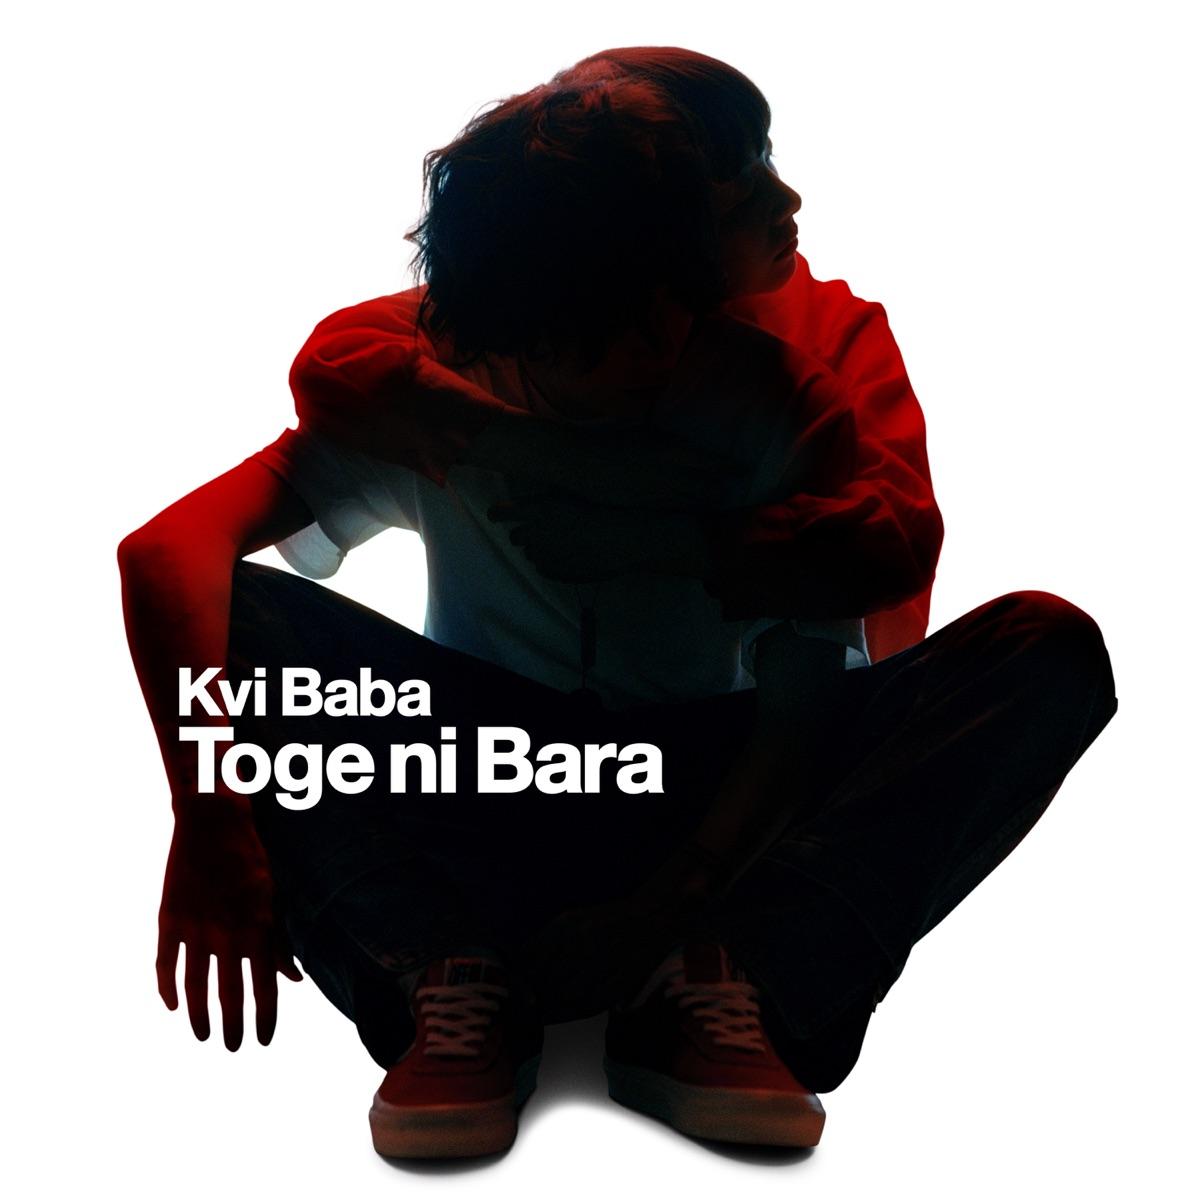 『Kvi Baba - Fool in the Moon』収録の『Toge ni Bara』ジャケット